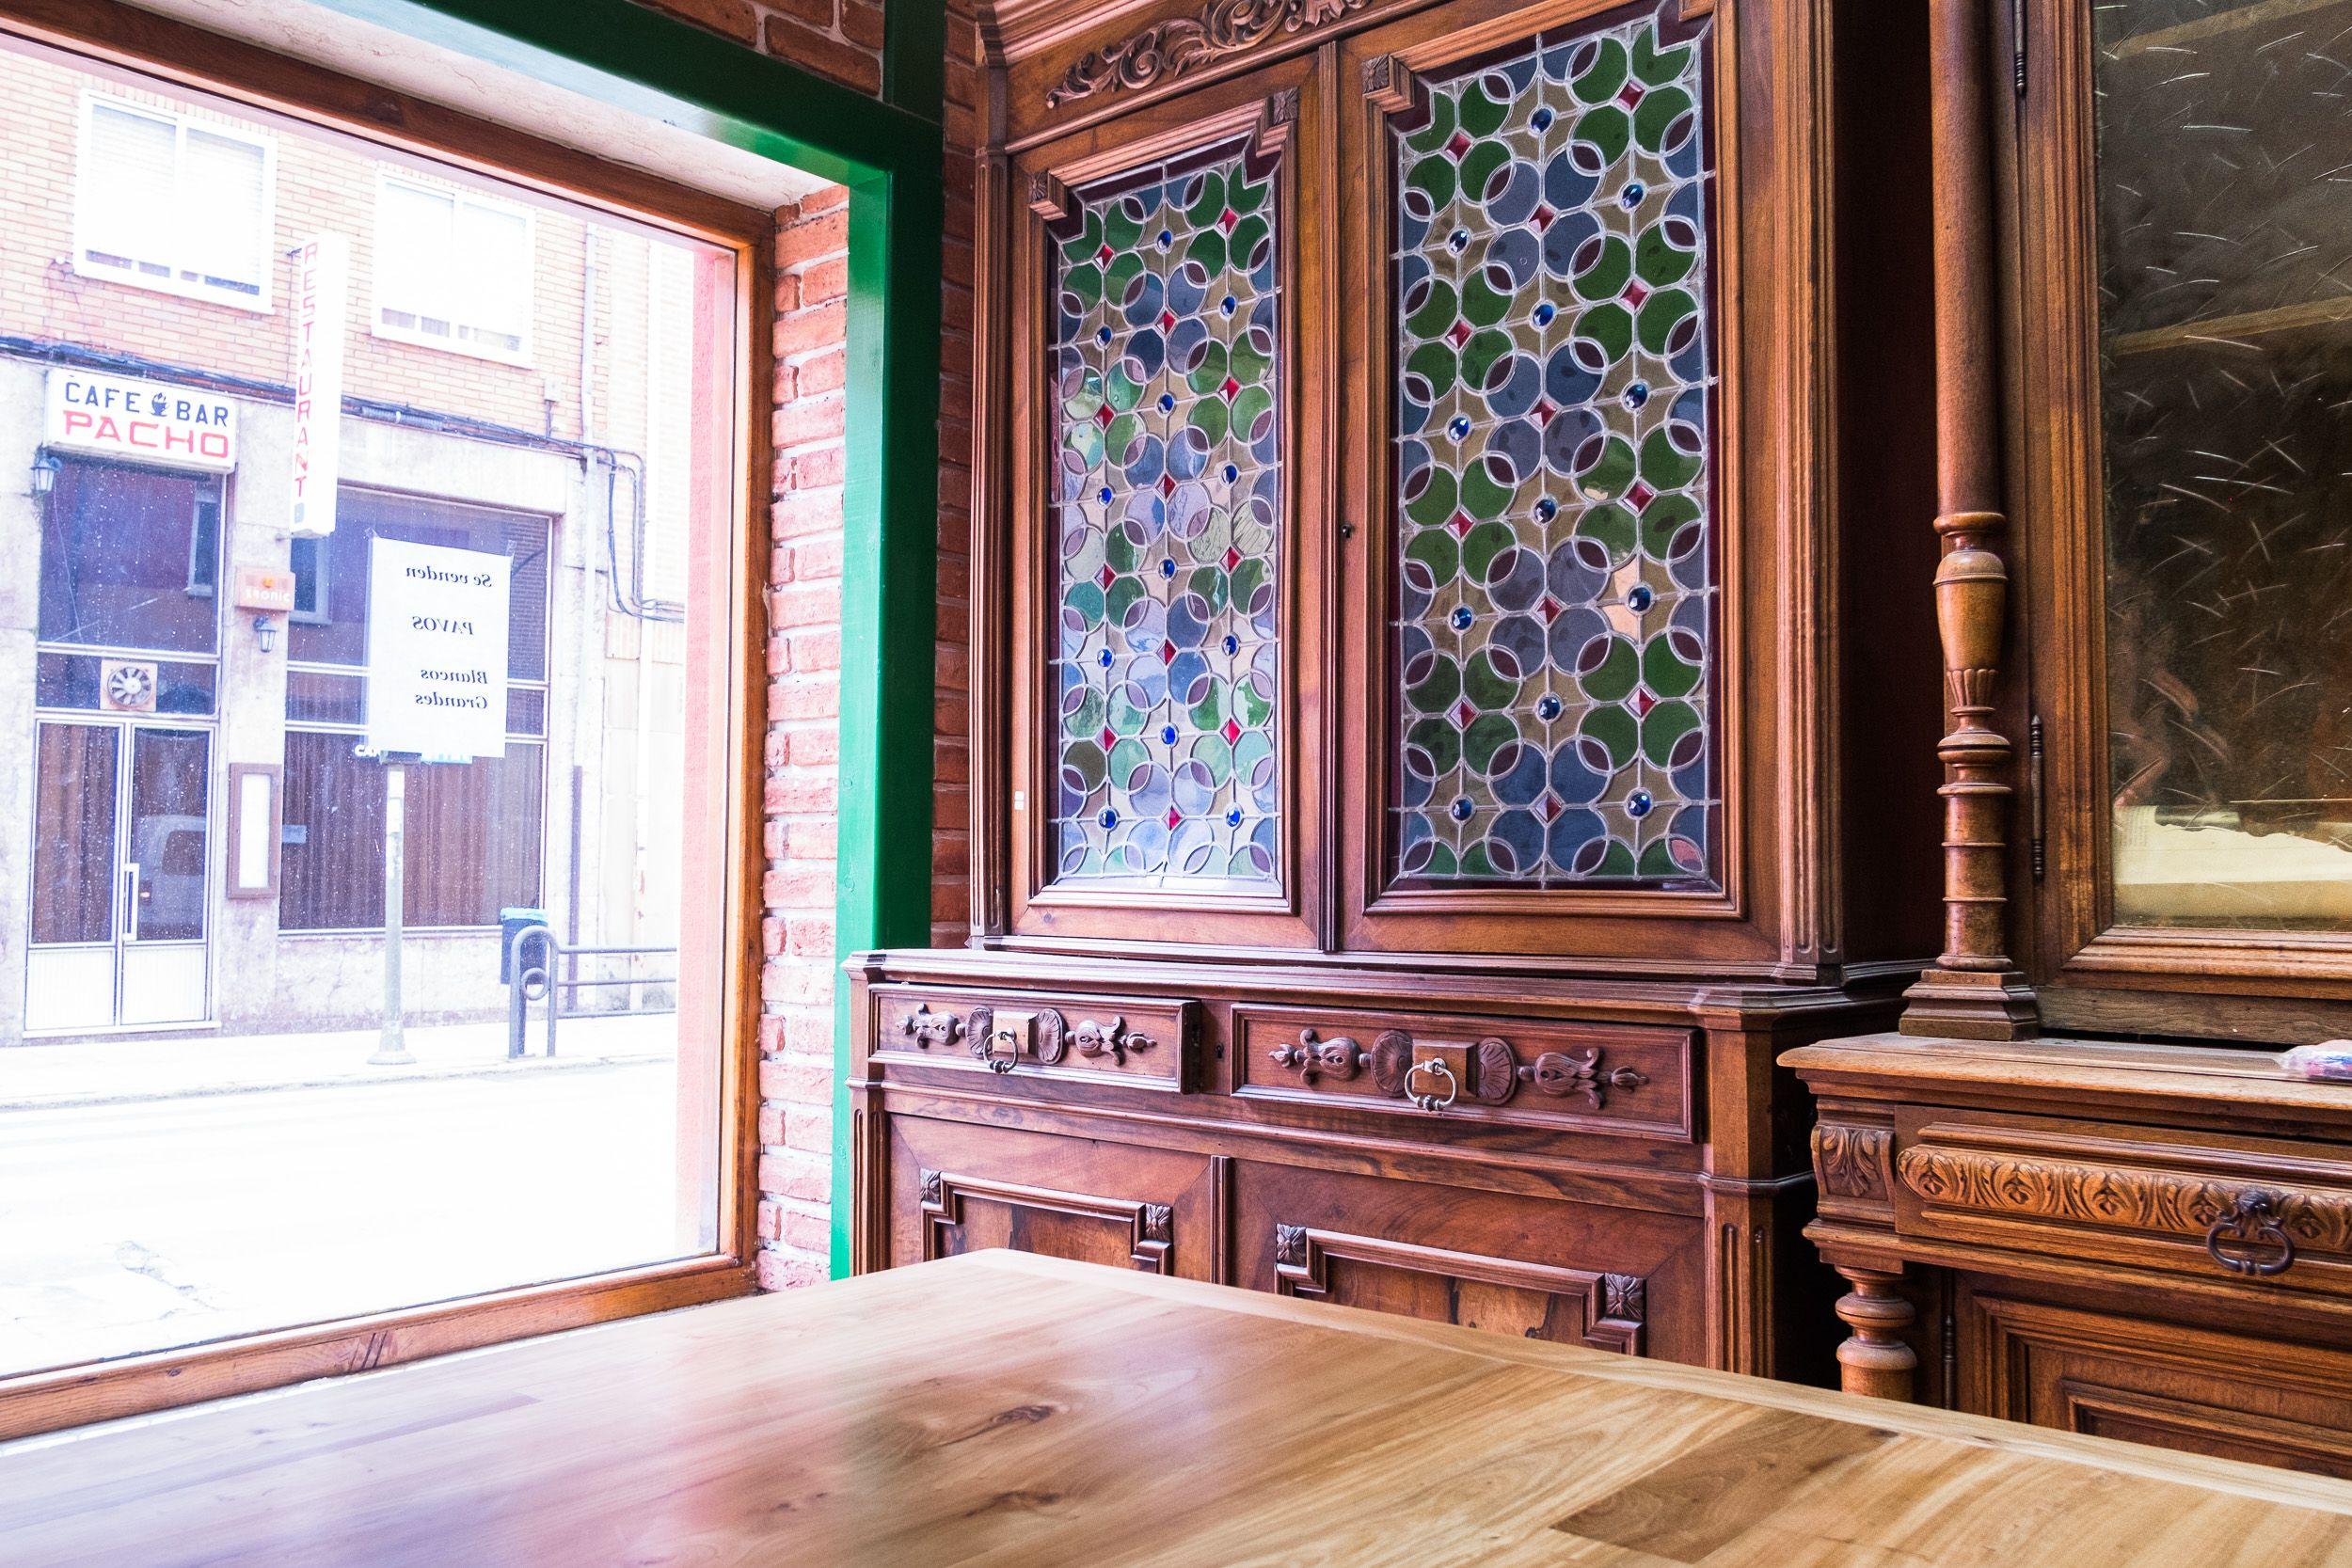 Venta de muebles rústicos de diseño en madera maciza en Sahagún, León